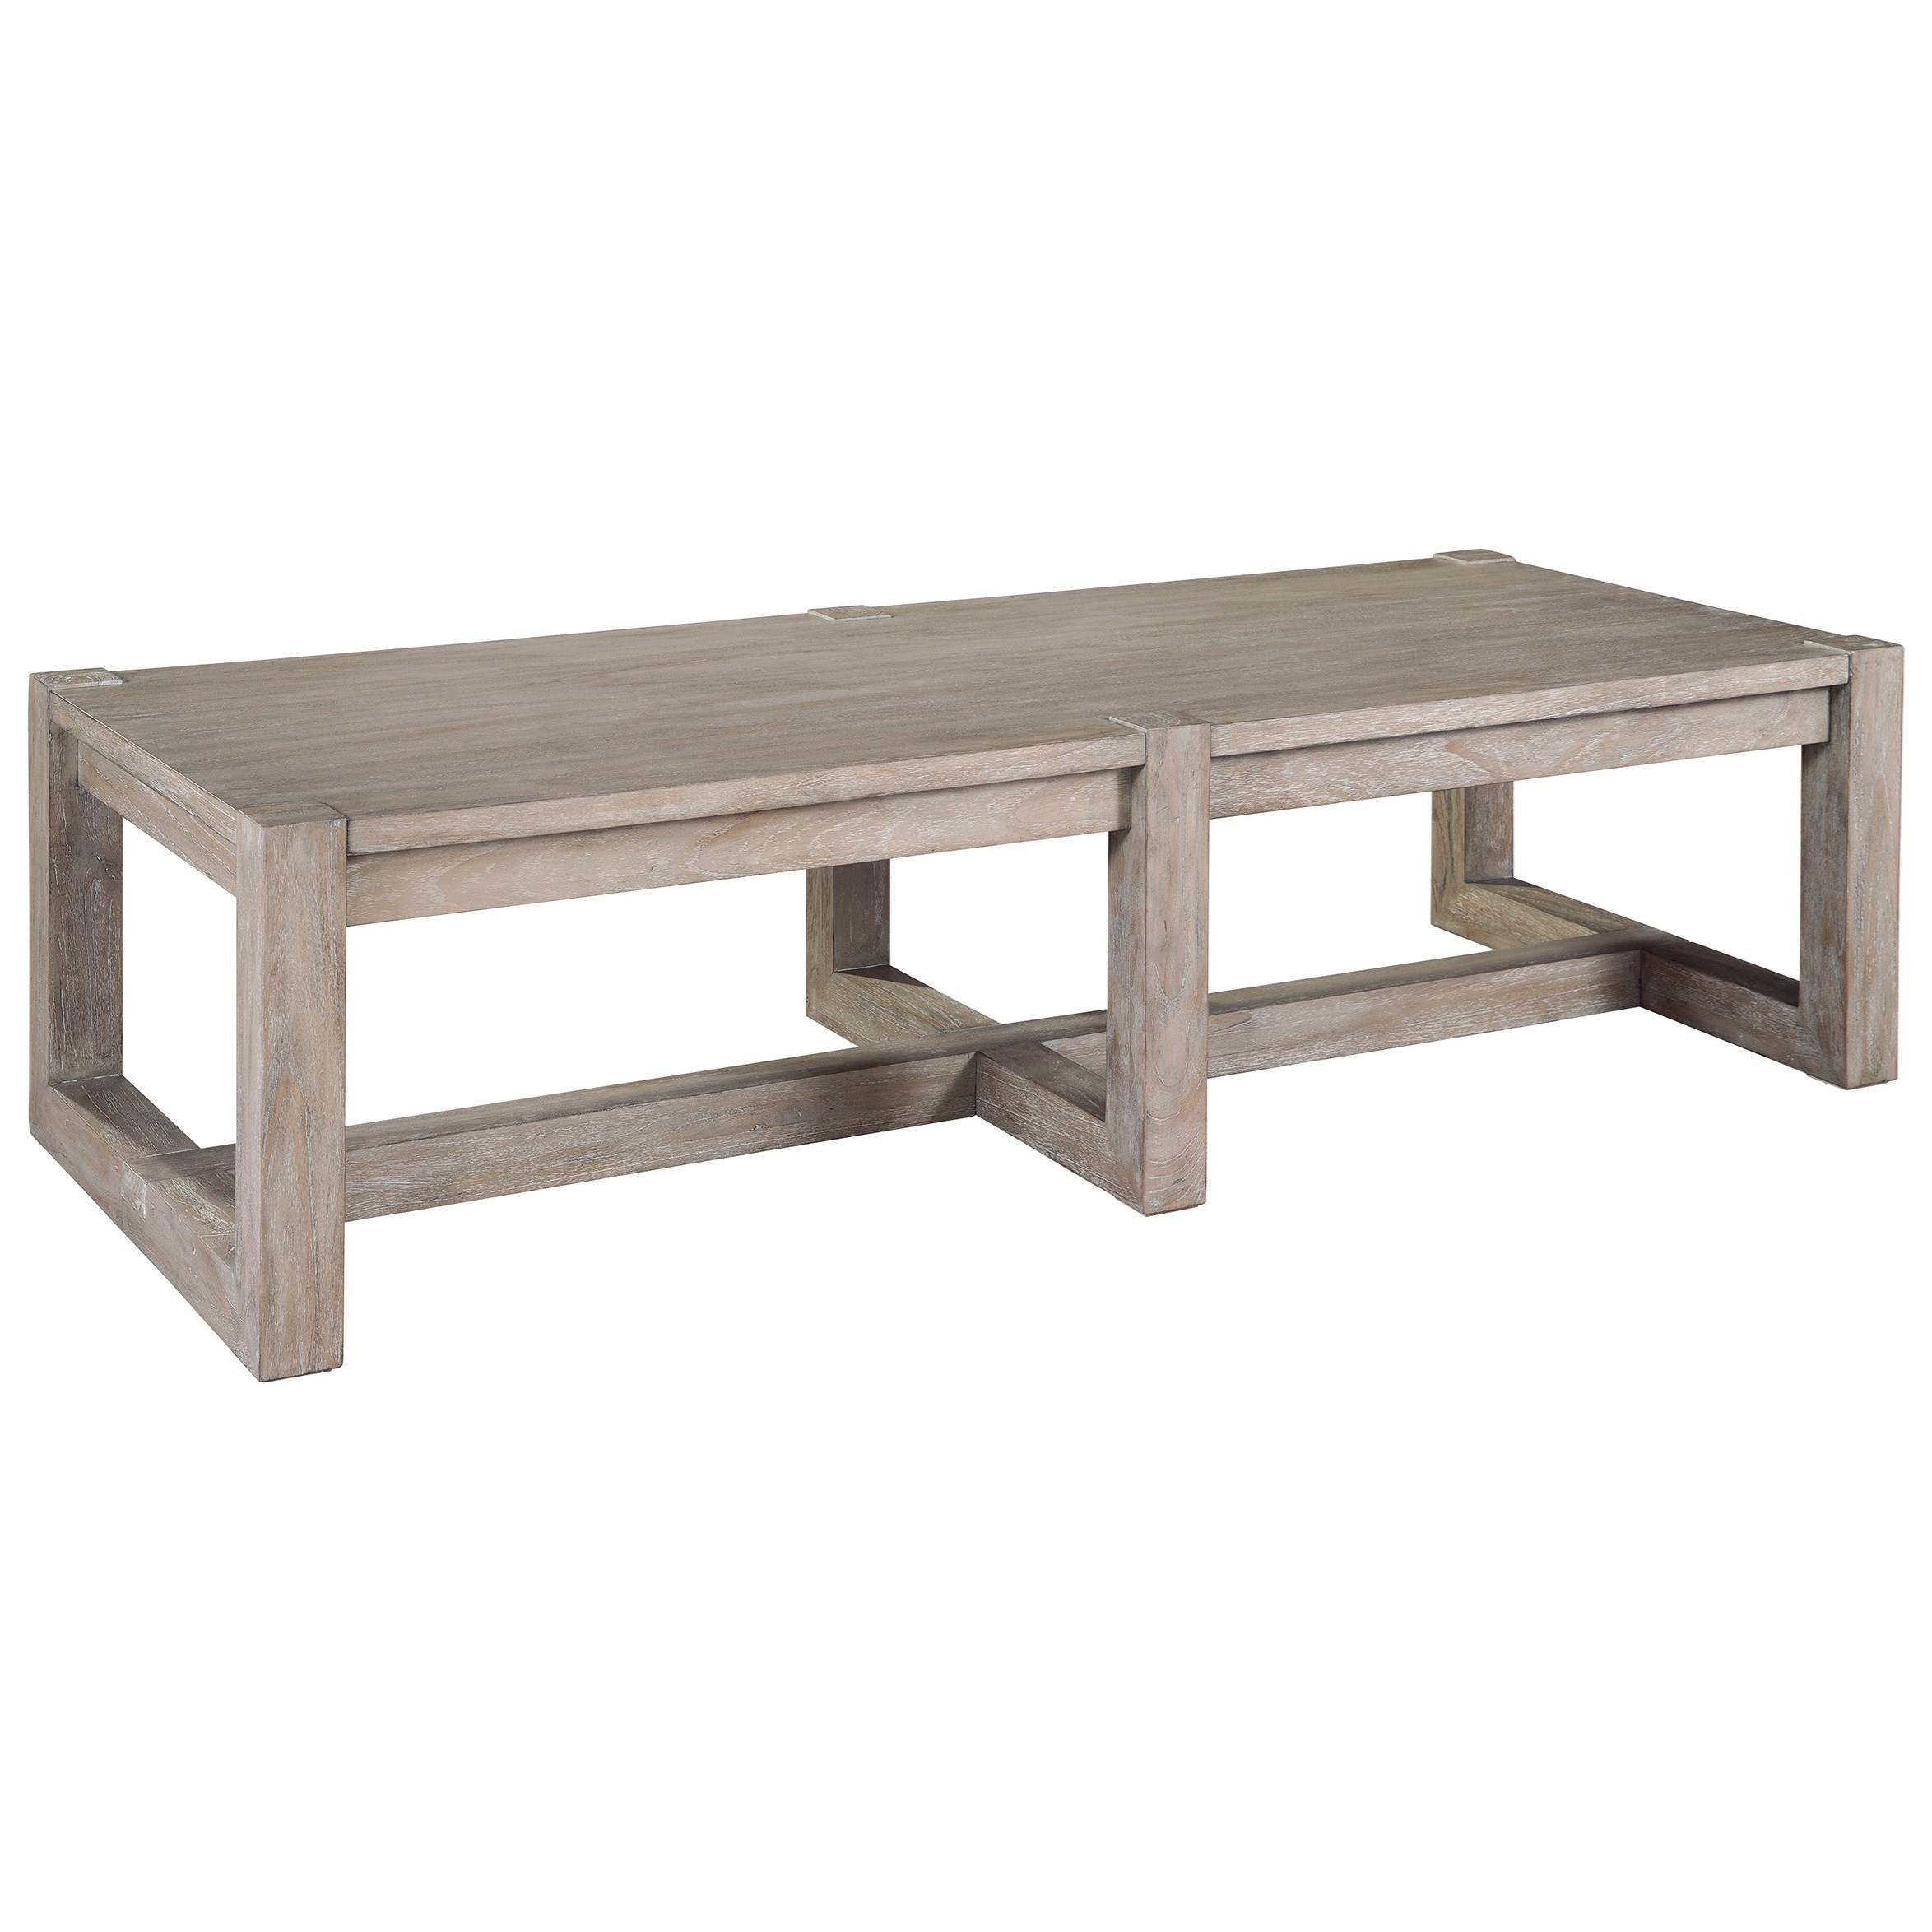 Hekman Berkeley Heights Rectangular Wood Top Coffee Table   Item Number:  1 7102